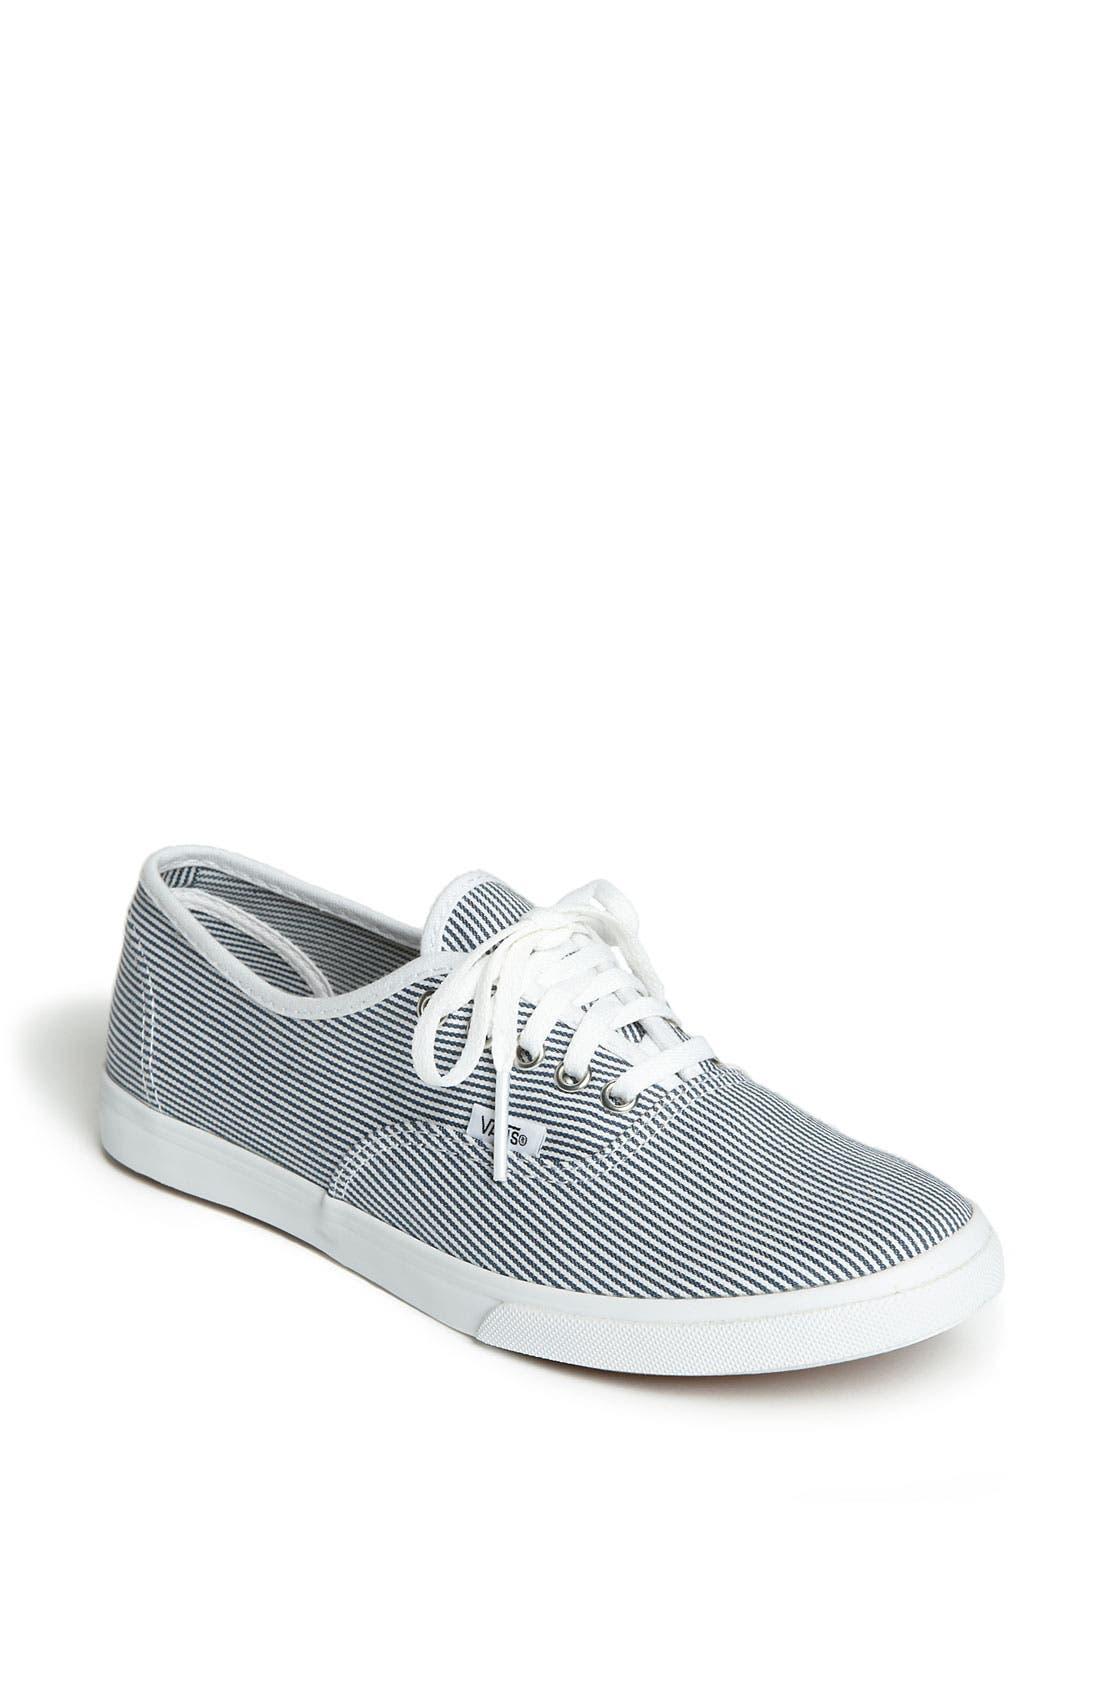 Alternate Image 1 Selected - Vans 'Authentic Lo Pro' Sneaker (Women)